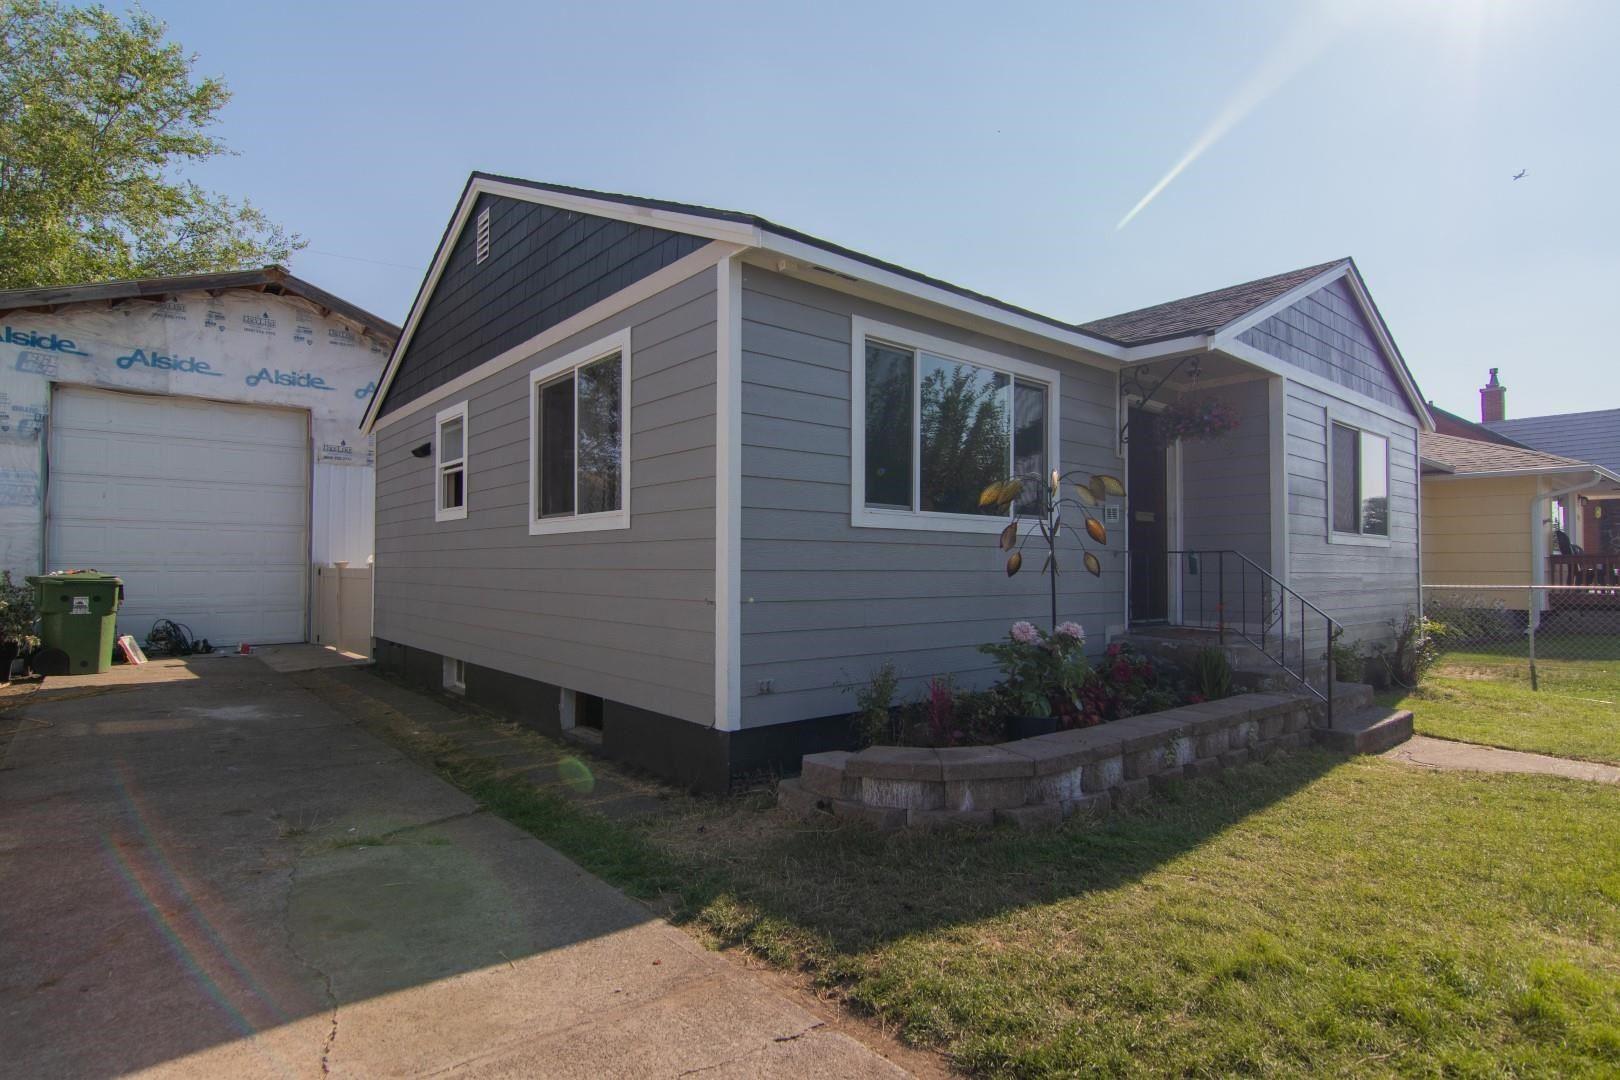 518 E LaCrosse Ave, Spokane, WA 99207 - #: 202119747